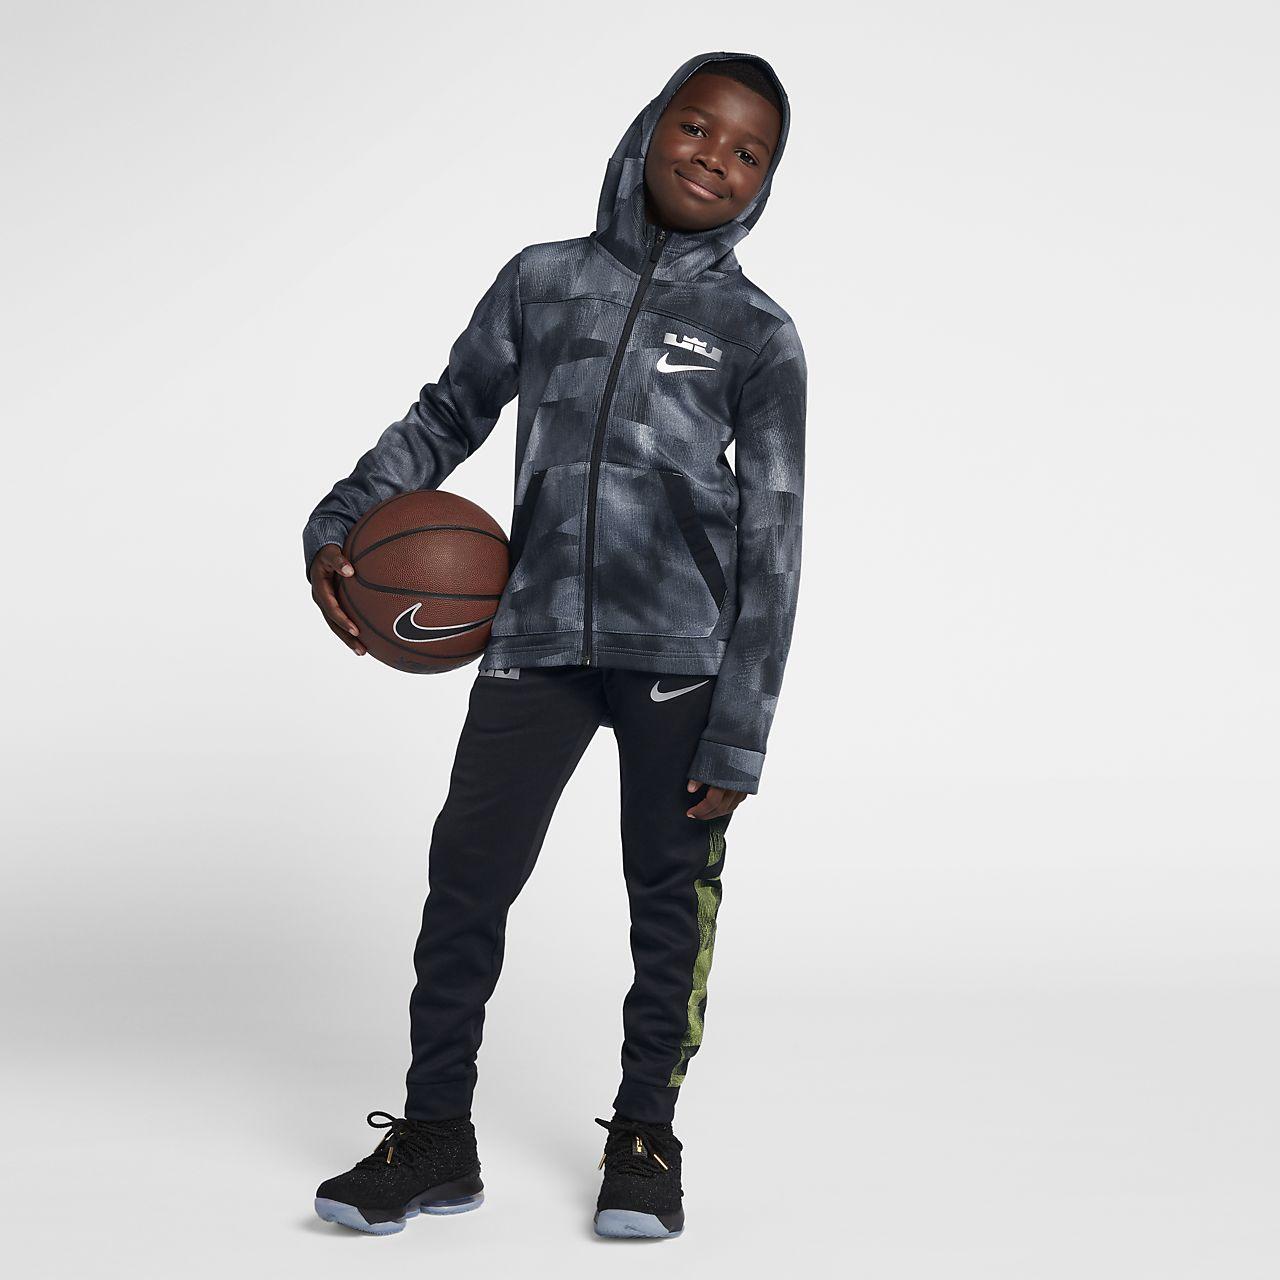 6492b905e505 LeBron Big Kids  (Boys ) Full-Zip Basketball Hoodie. Nike.com